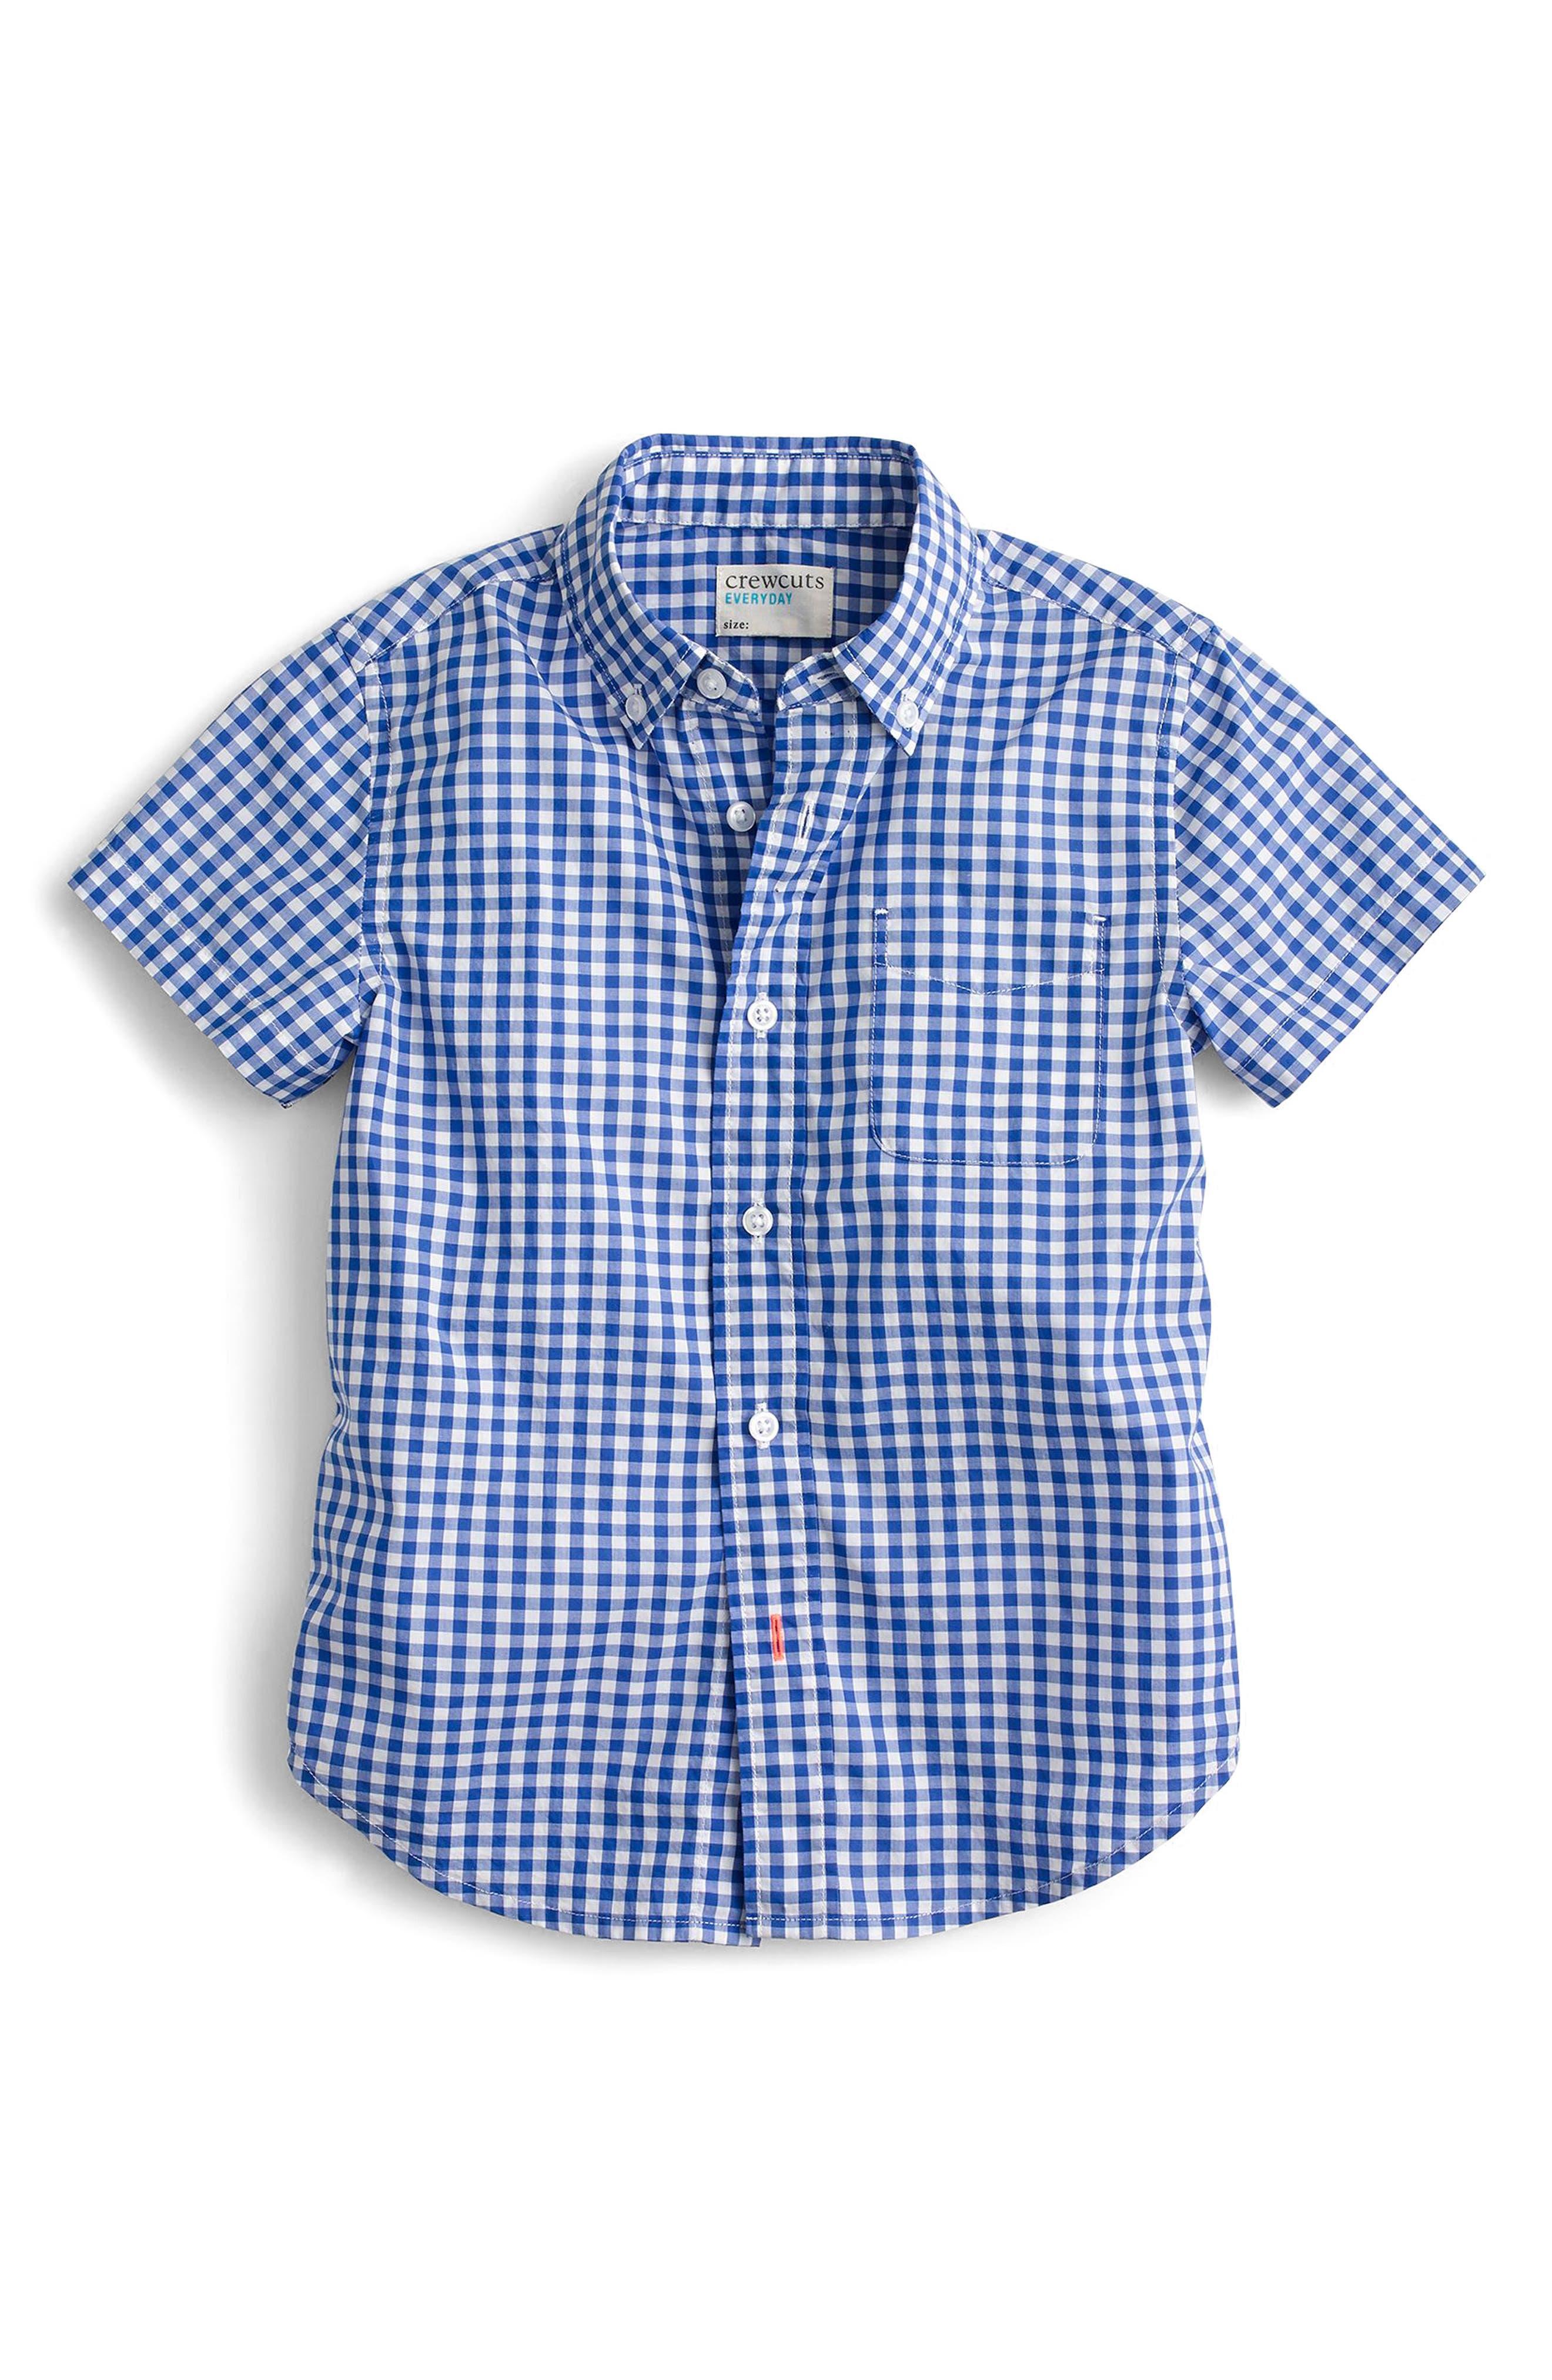 Secret Wash Short Sleeve Gingham Shirt,                             Main thumbnail 1, color,                             Rain Blue White